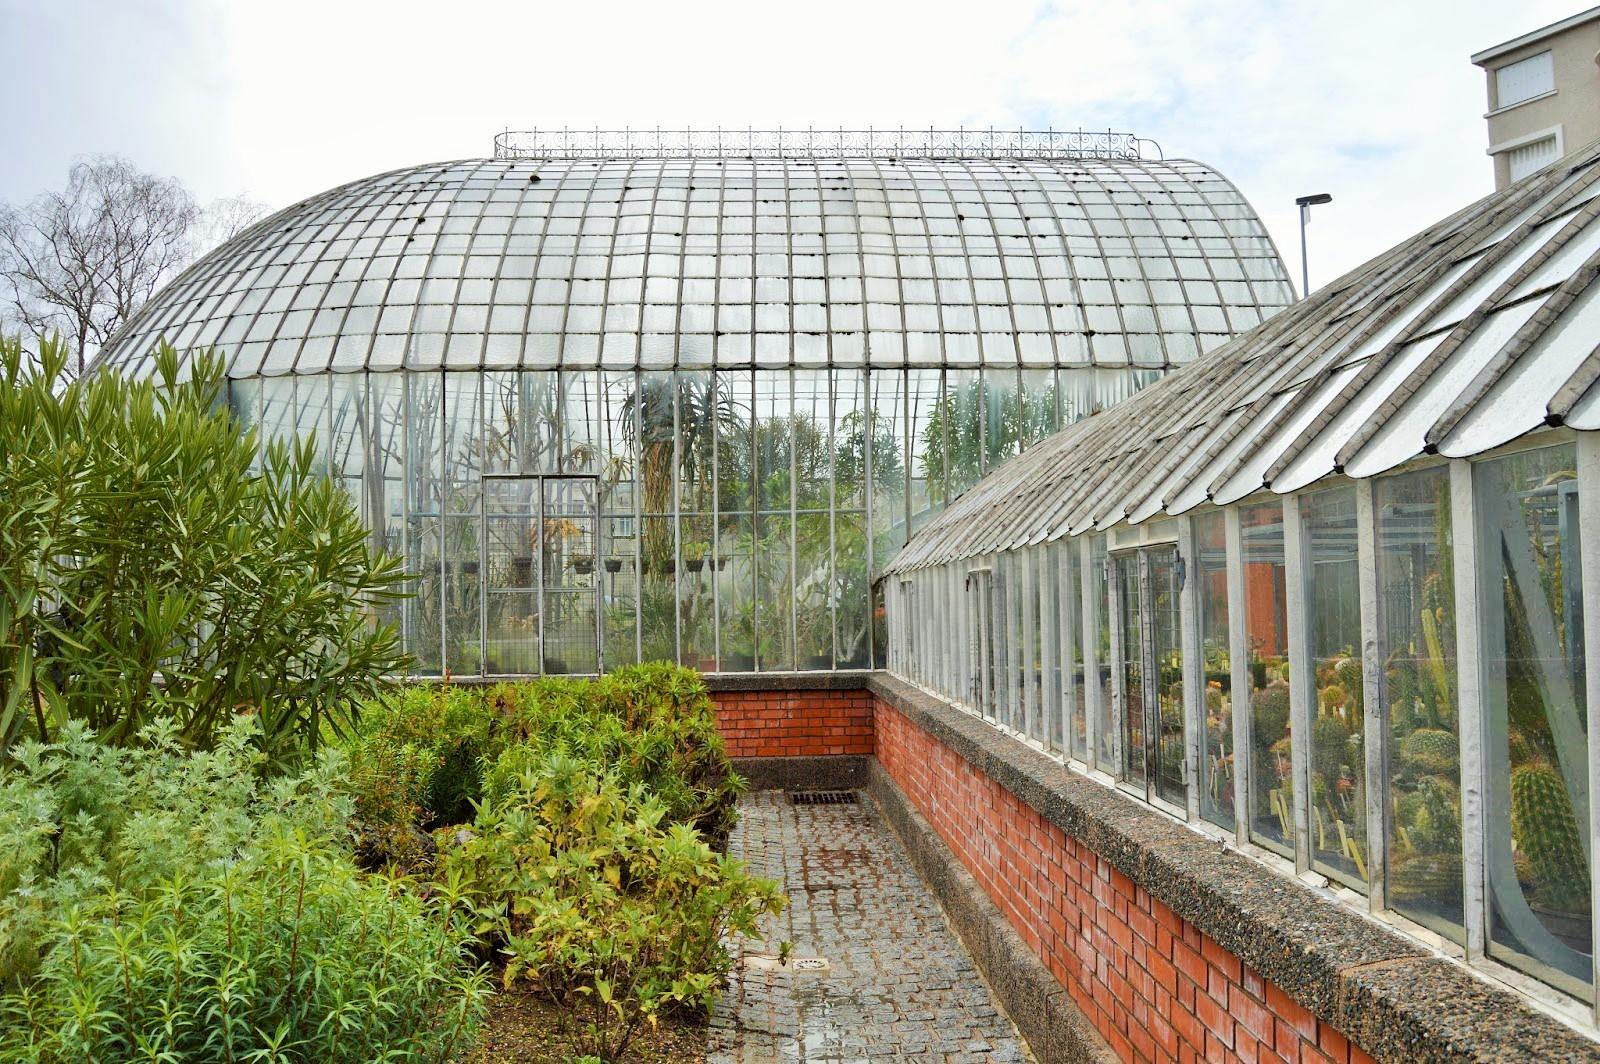 Best serre du jardin des plantes nantes images awesome interior home satellite - Petit jardin mediterraneen nantes ...